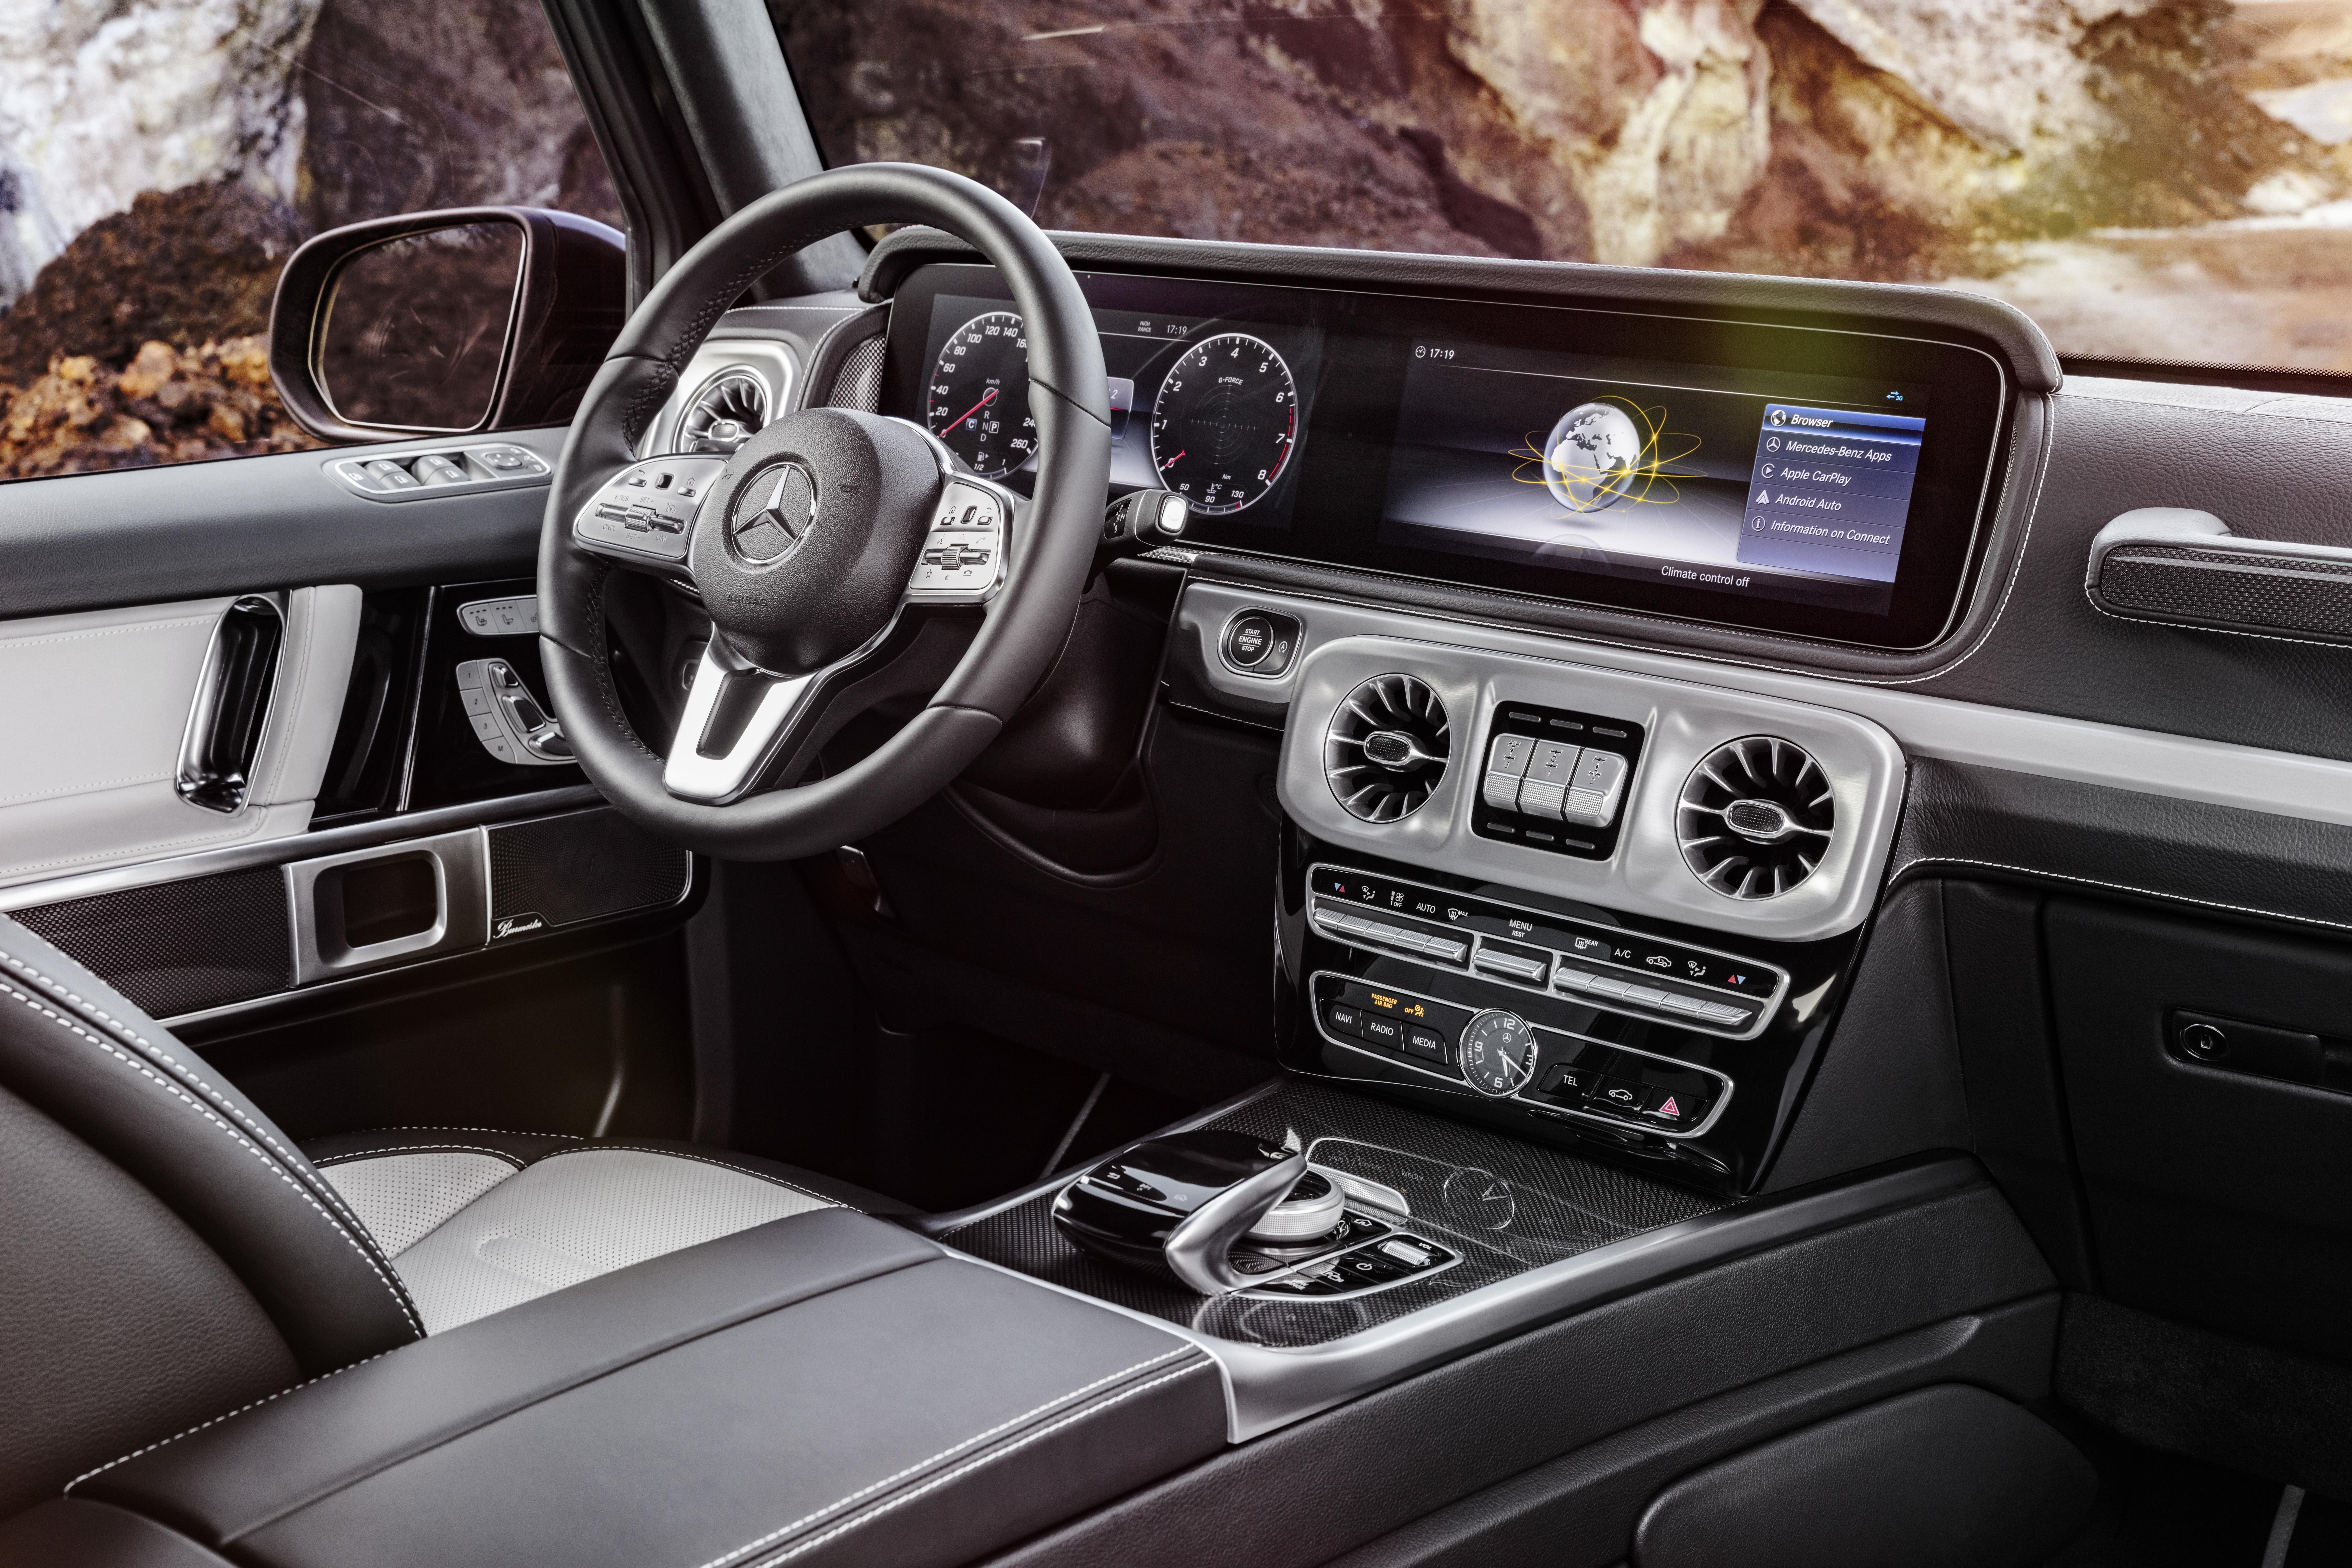 Mercedes-Benz G-Klasse 2018 Mercedes-Benz G-Class 2018